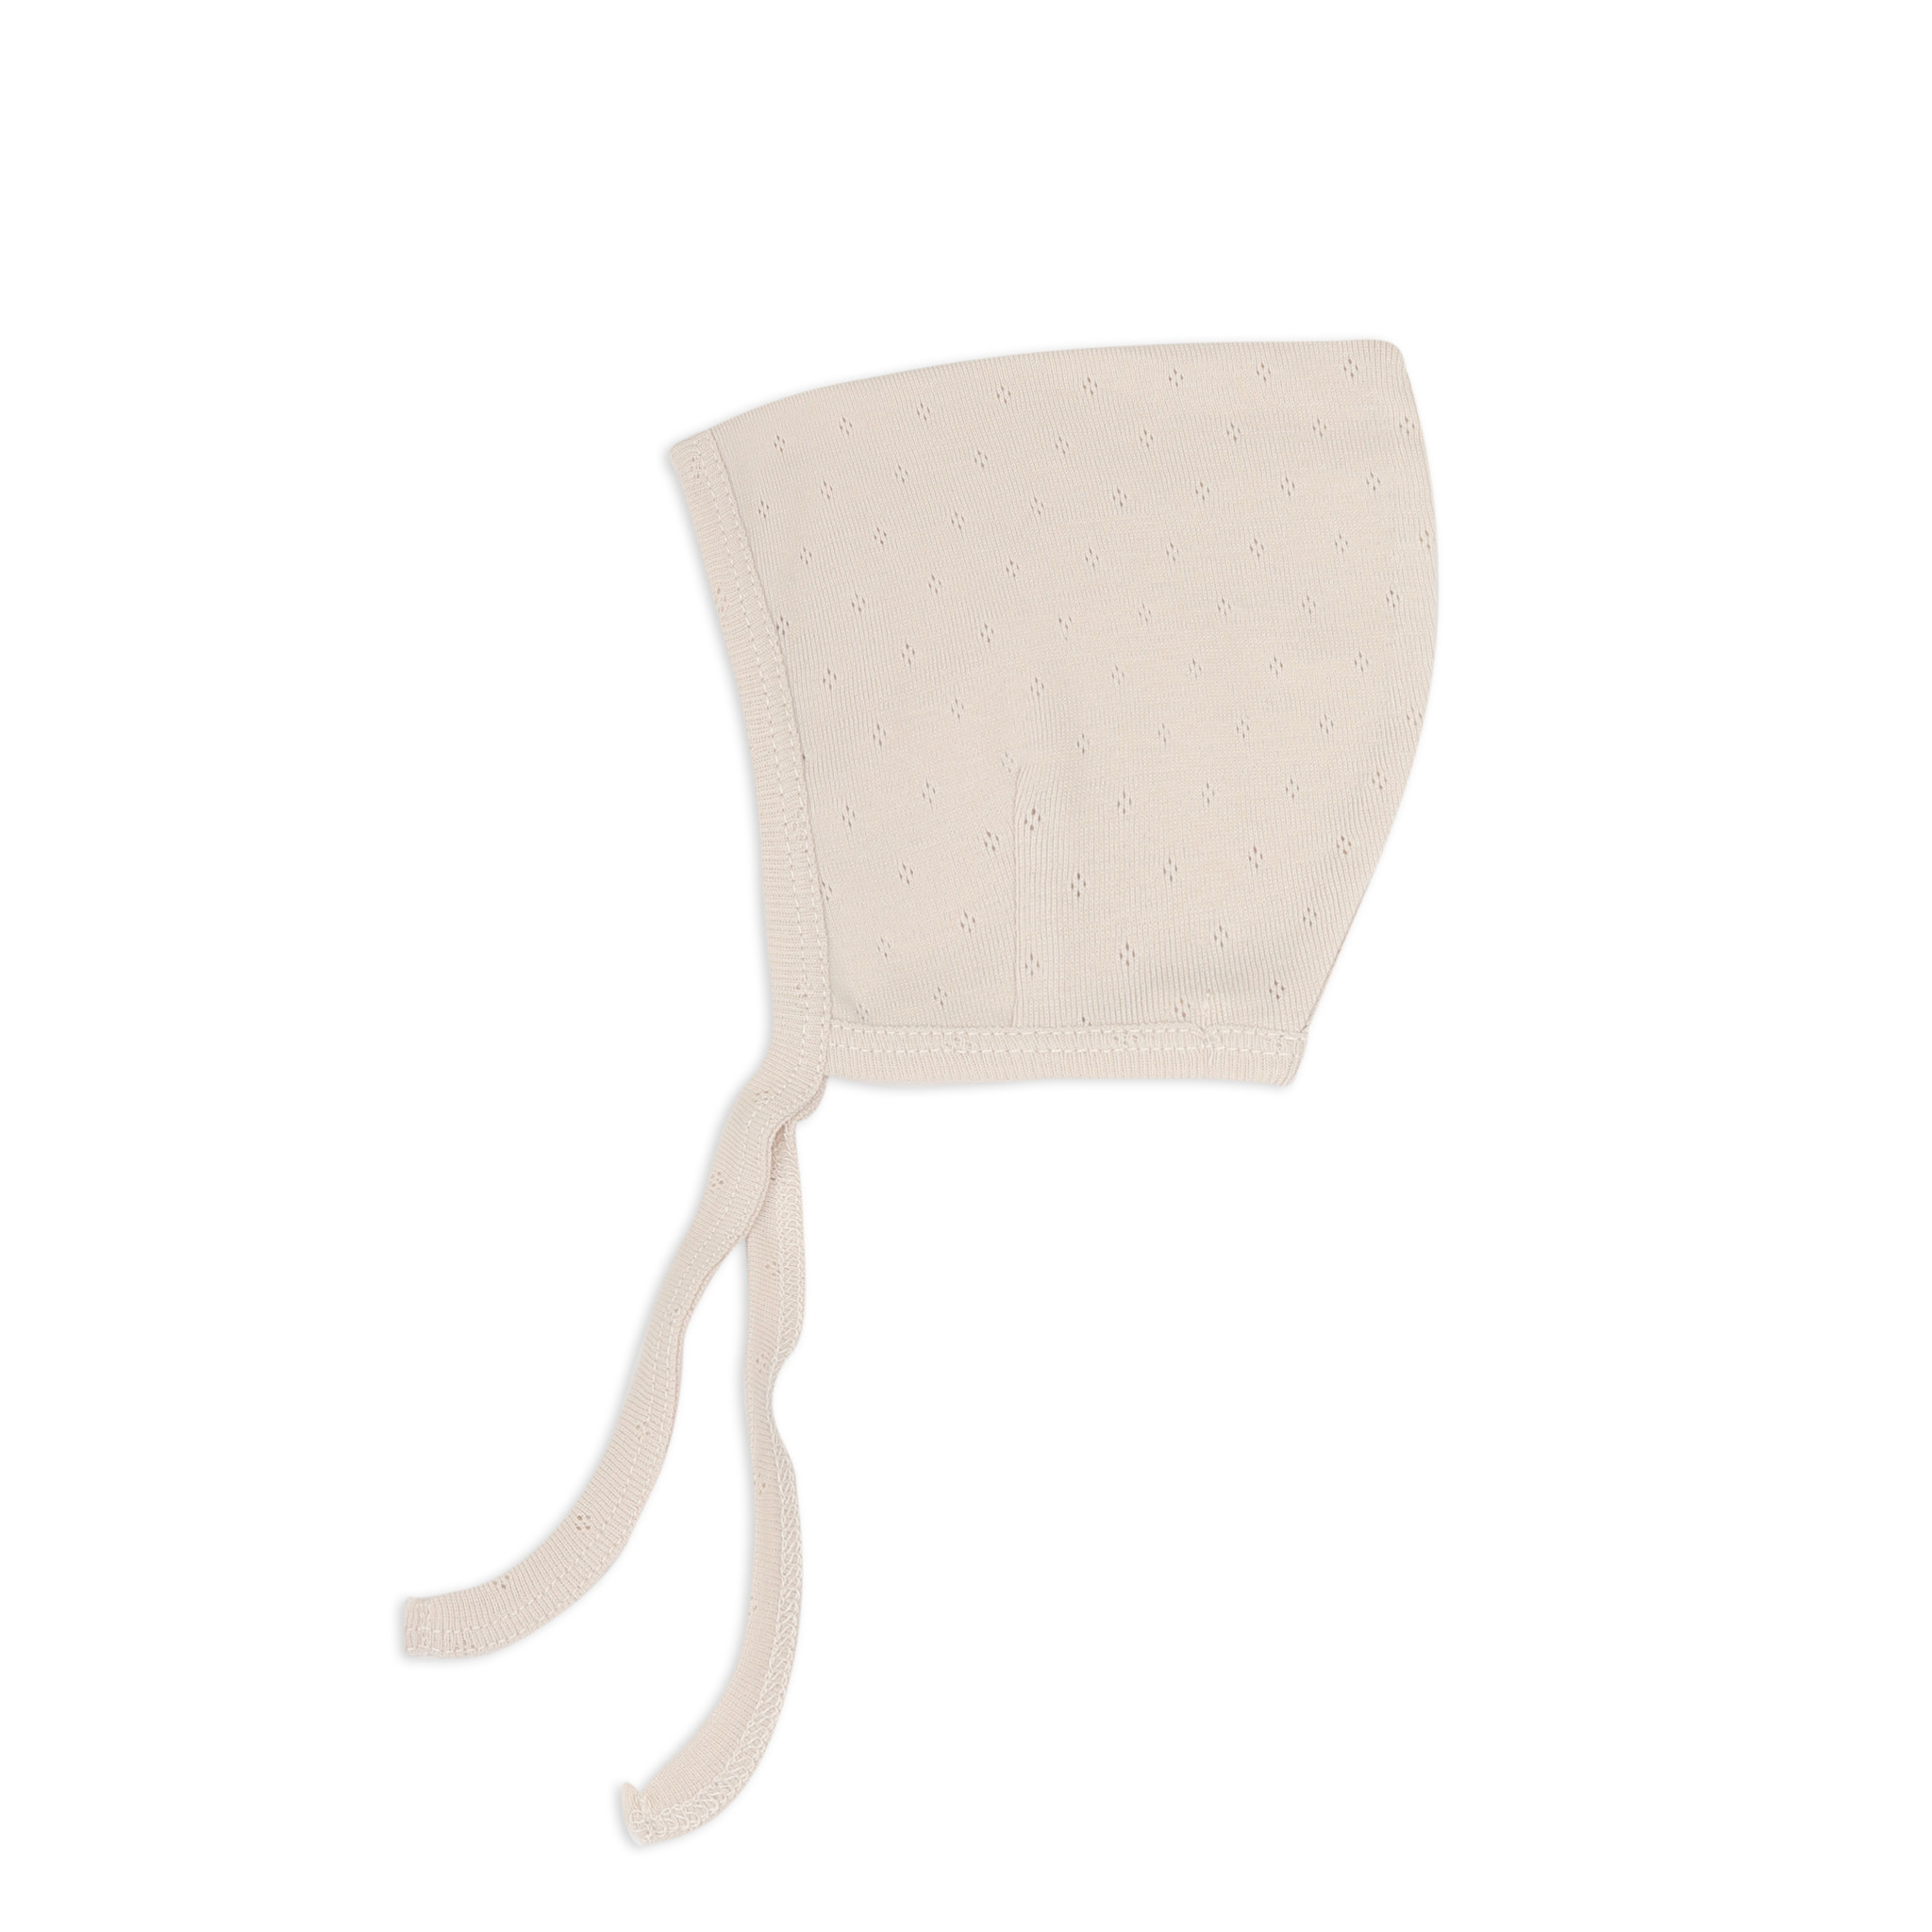 Pointed bonnet pointelle - Oatmeal-1